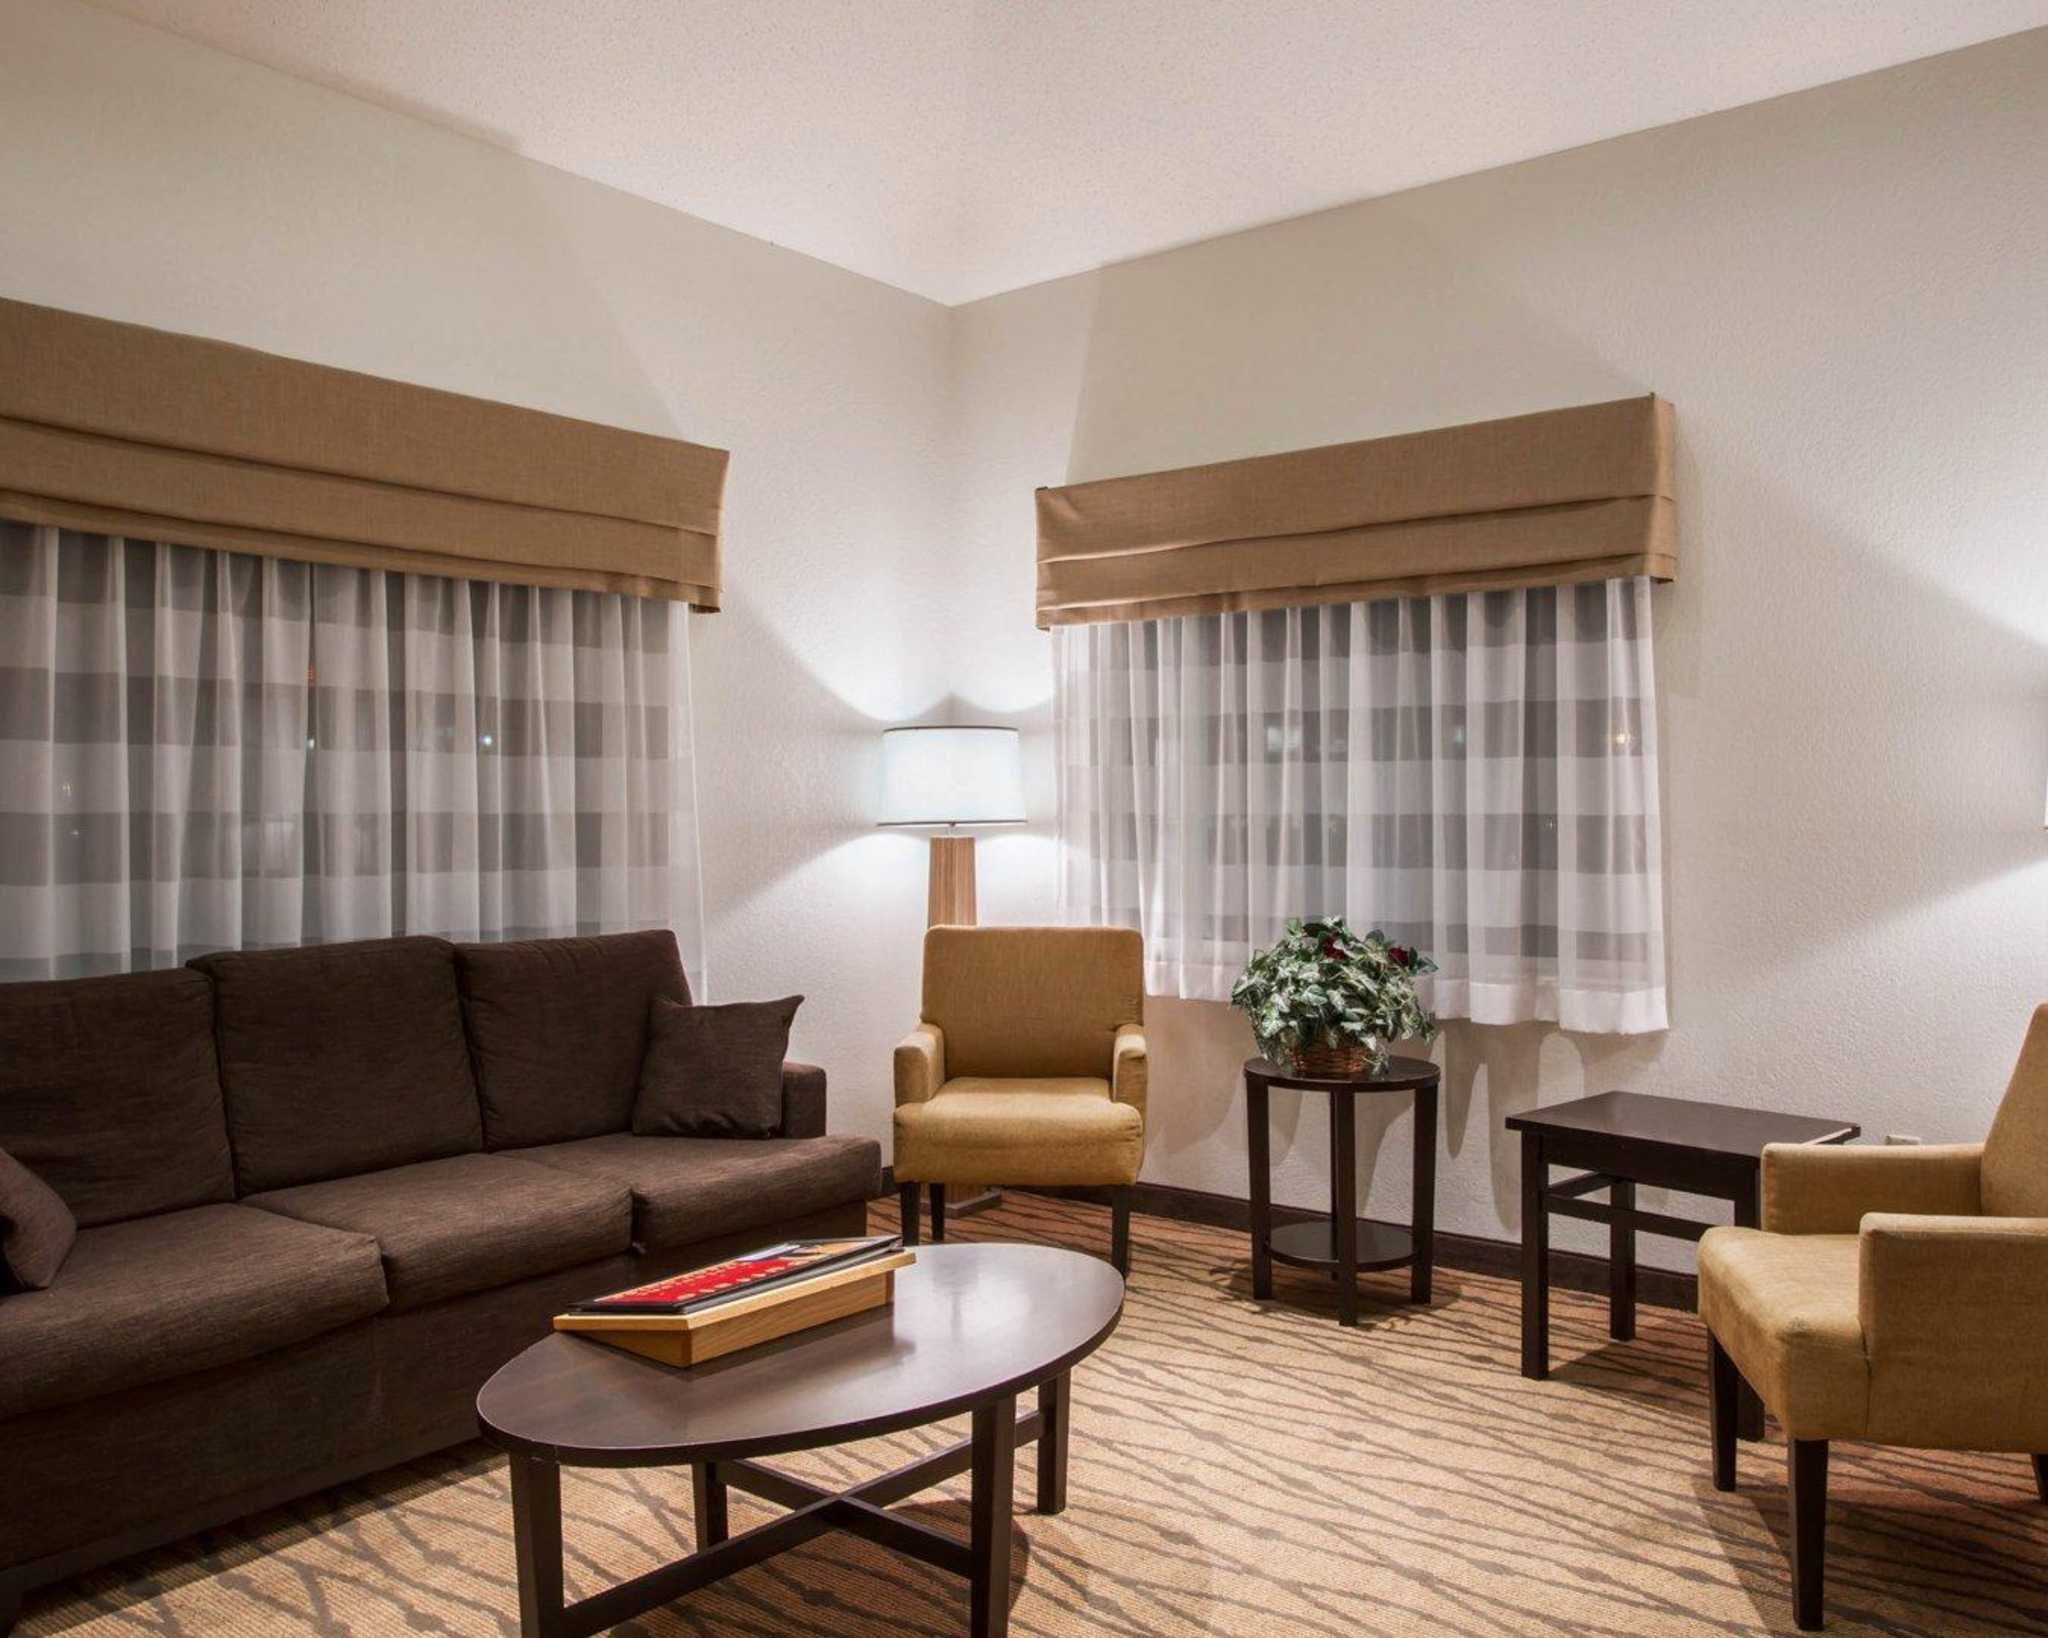 Sleep Inn & Suites Buffalo Airport image 14